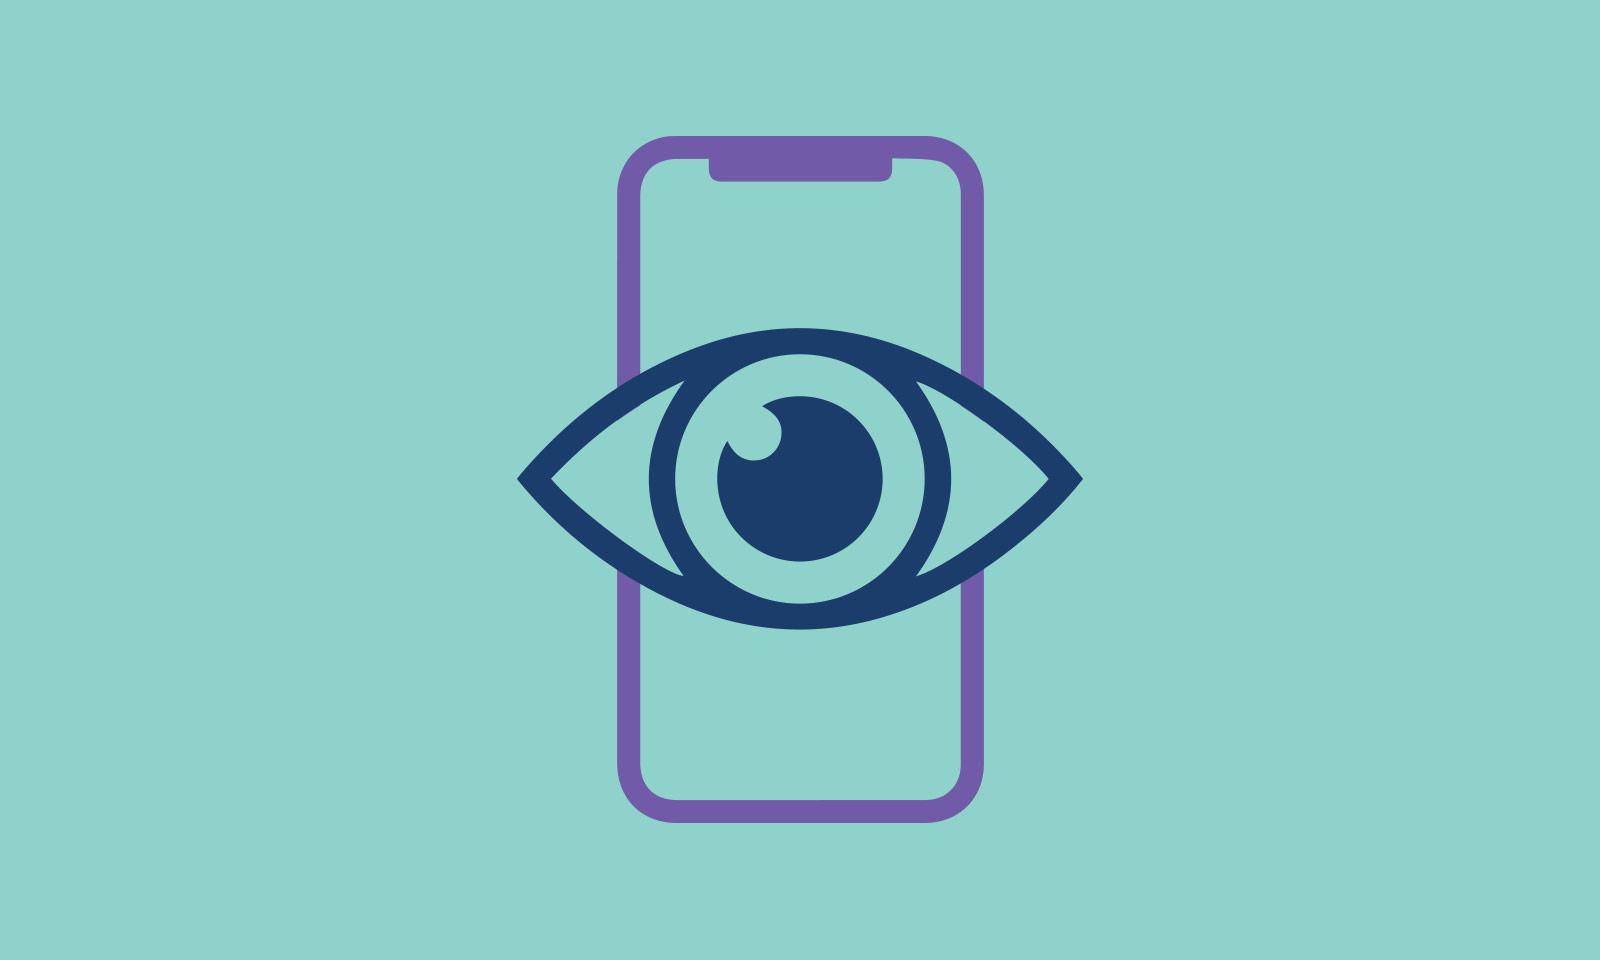 Как сниффить HTTPS-трафик iOS-устройства - 1